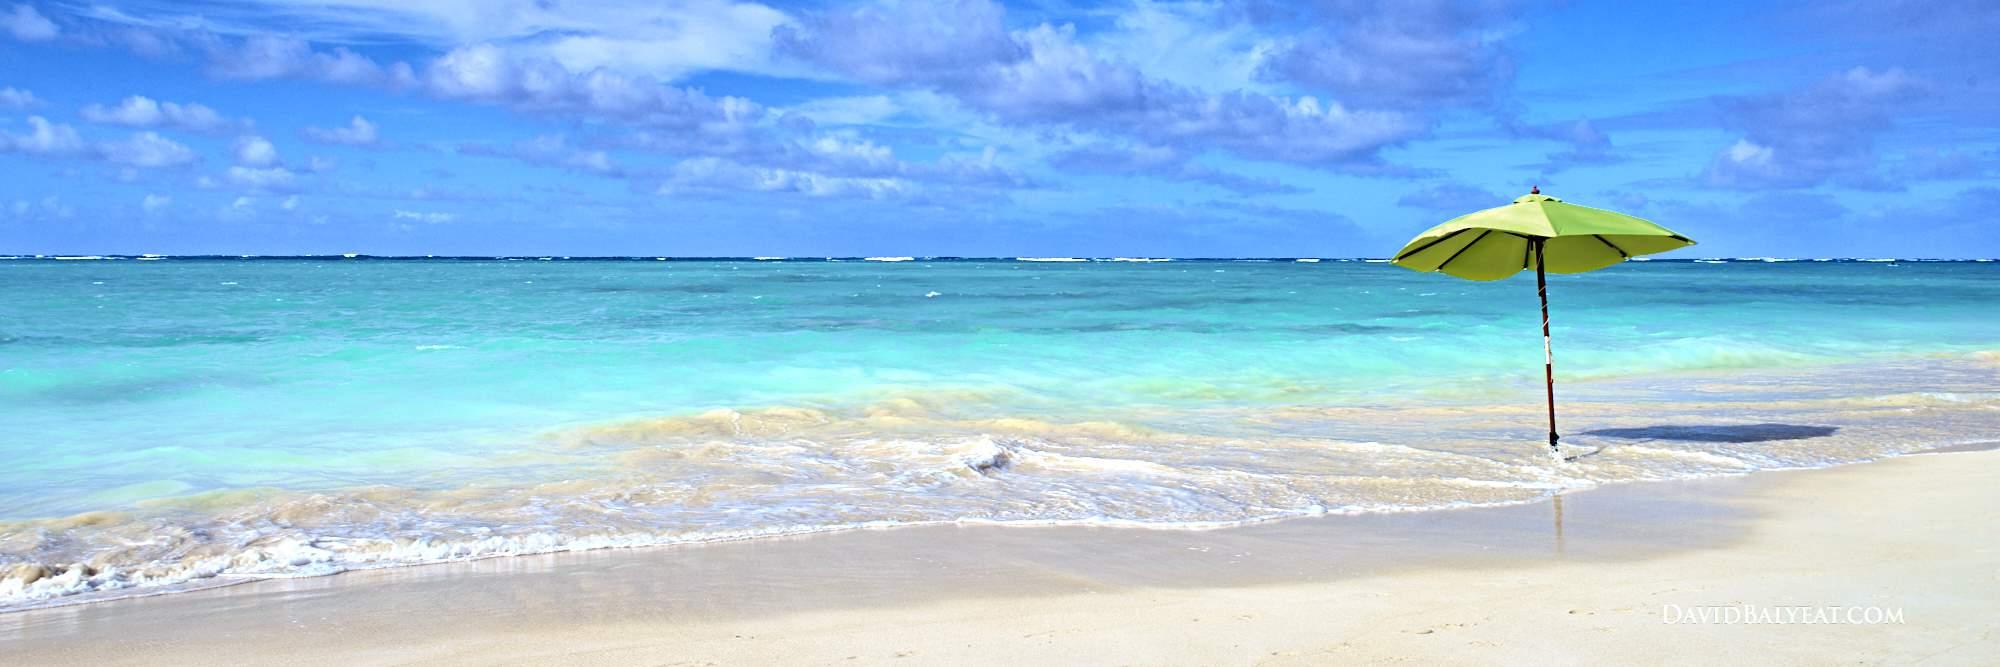 Lanikai Beach panoramic Hawaii Oahu high-definition HD professional photography